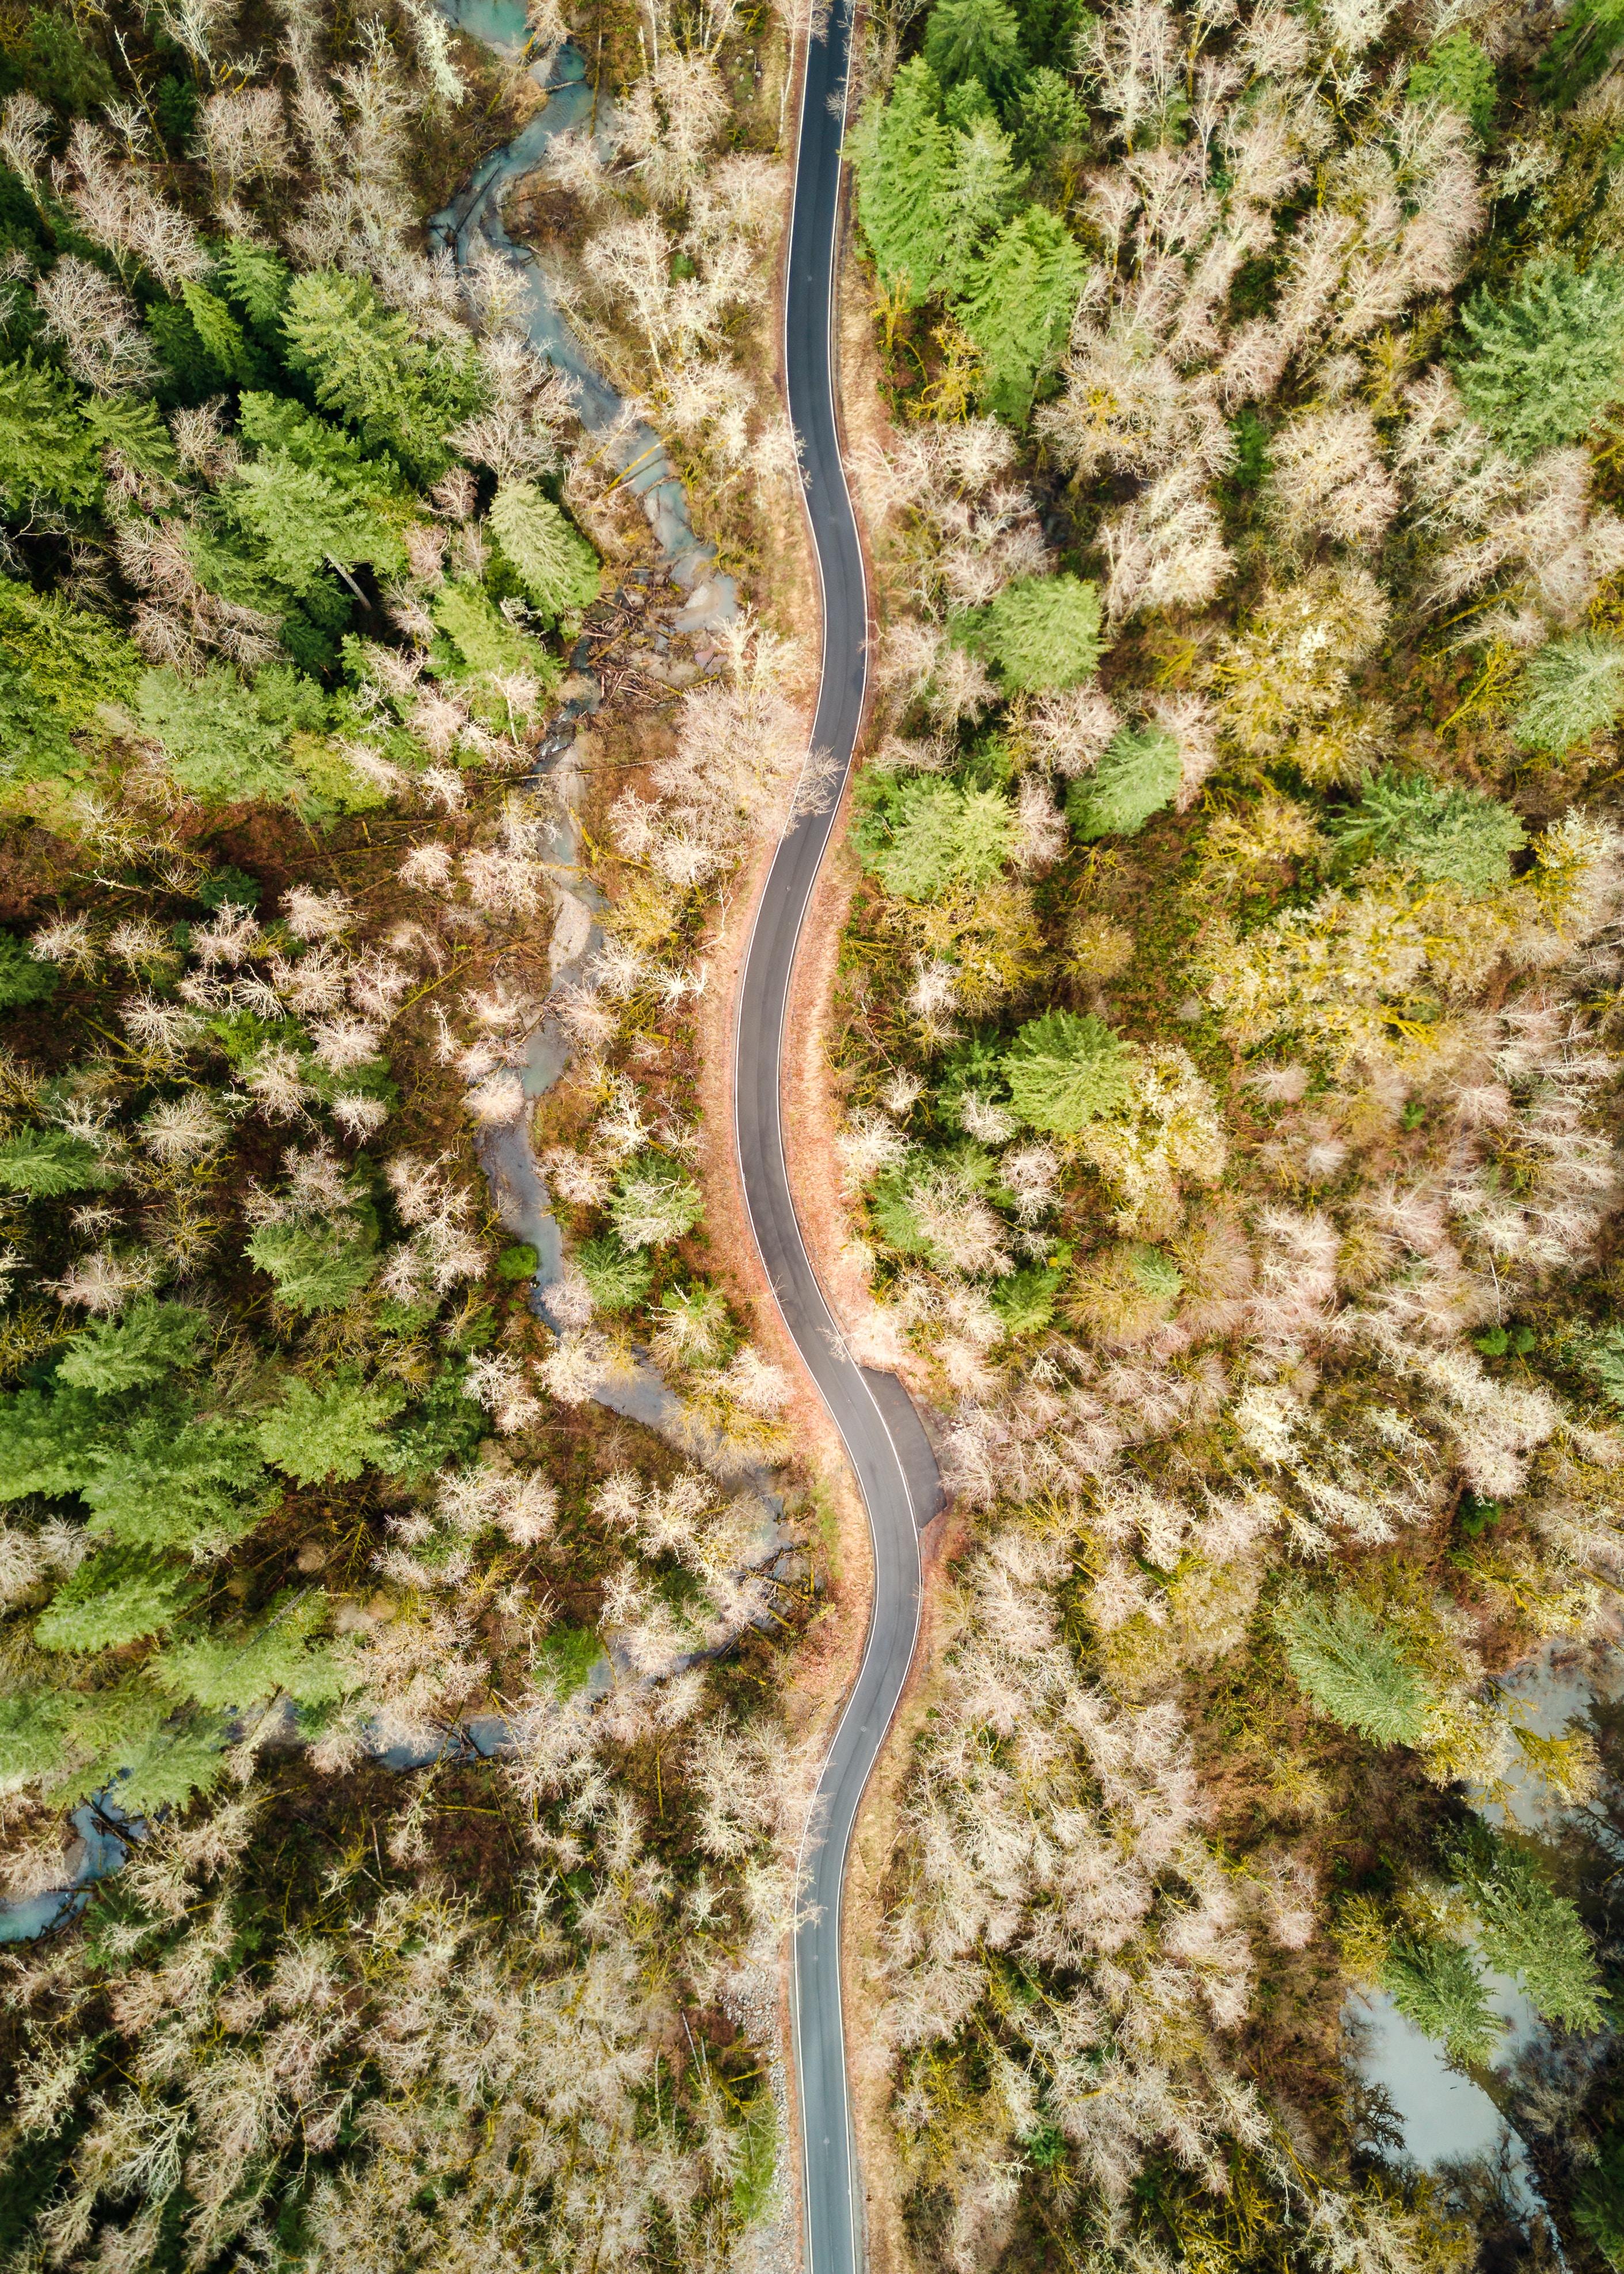 aerial view of road between trees